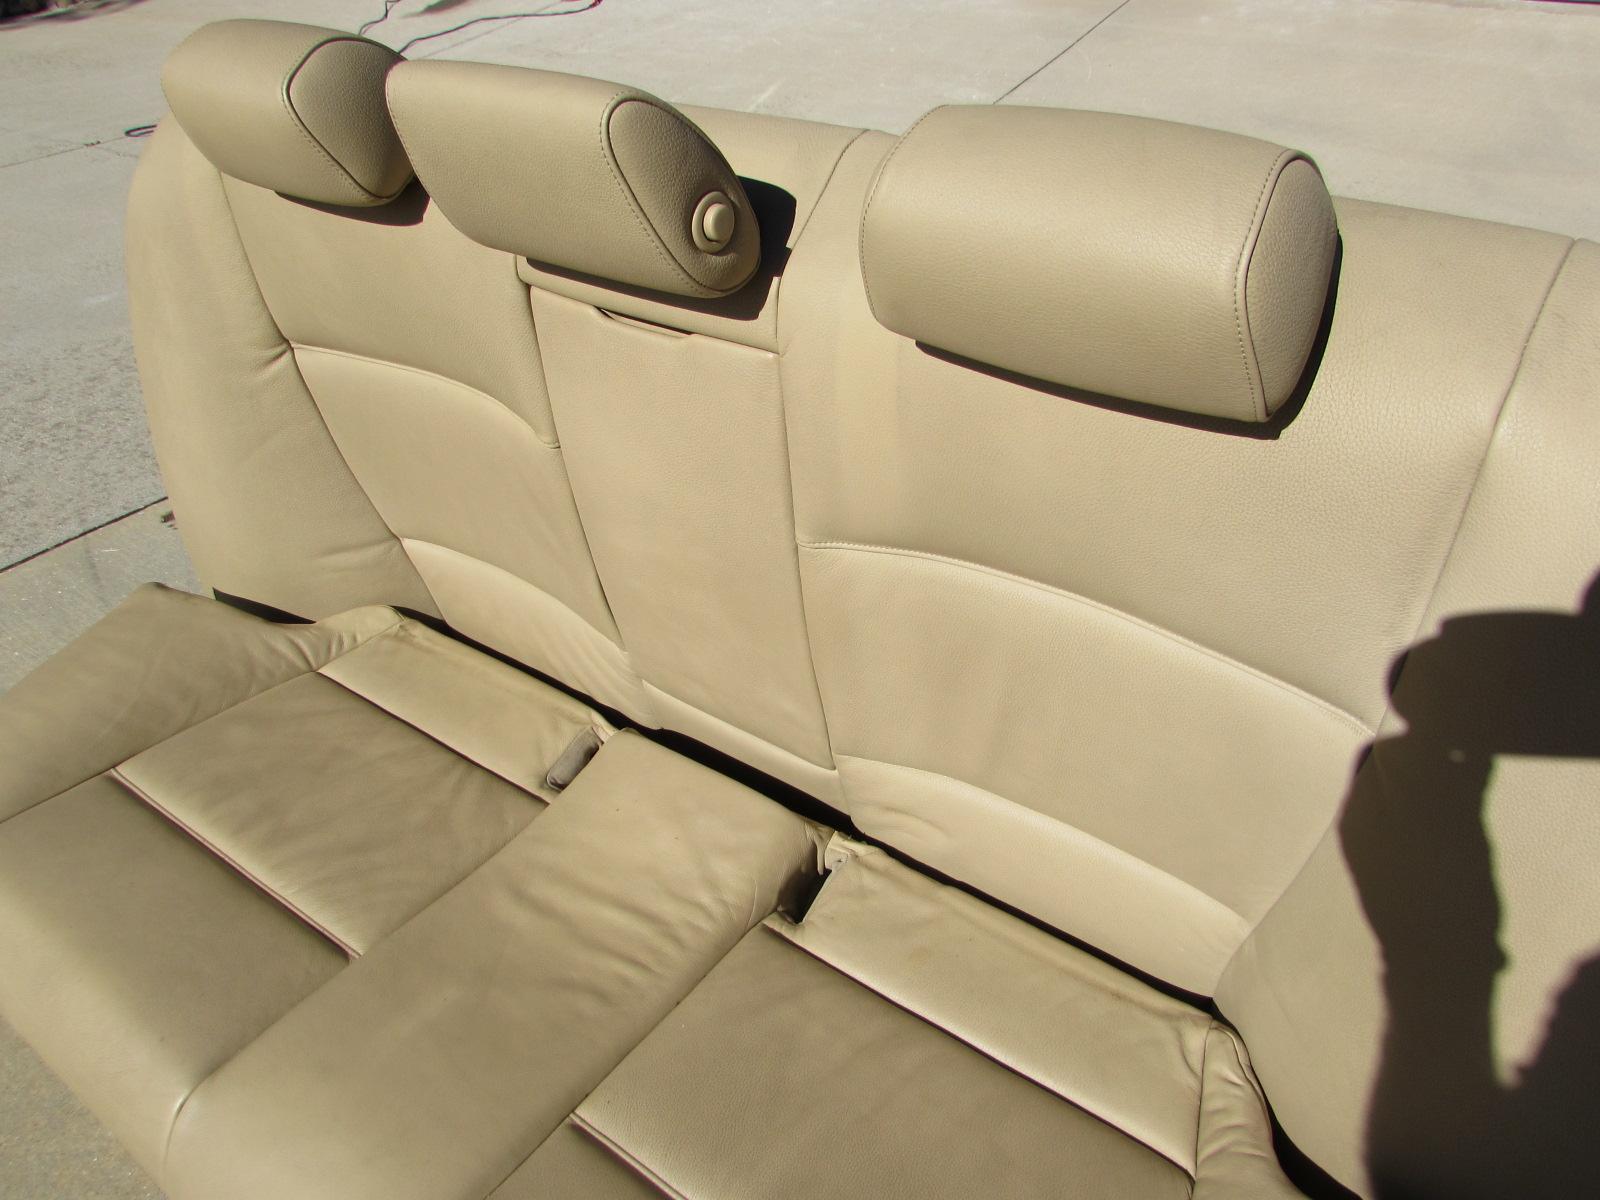 bmw rear seats 52207118745 e90 323i 325i 328i 330i 335i m3. Black Bedroom Furniture Sets. Home Design Ideas